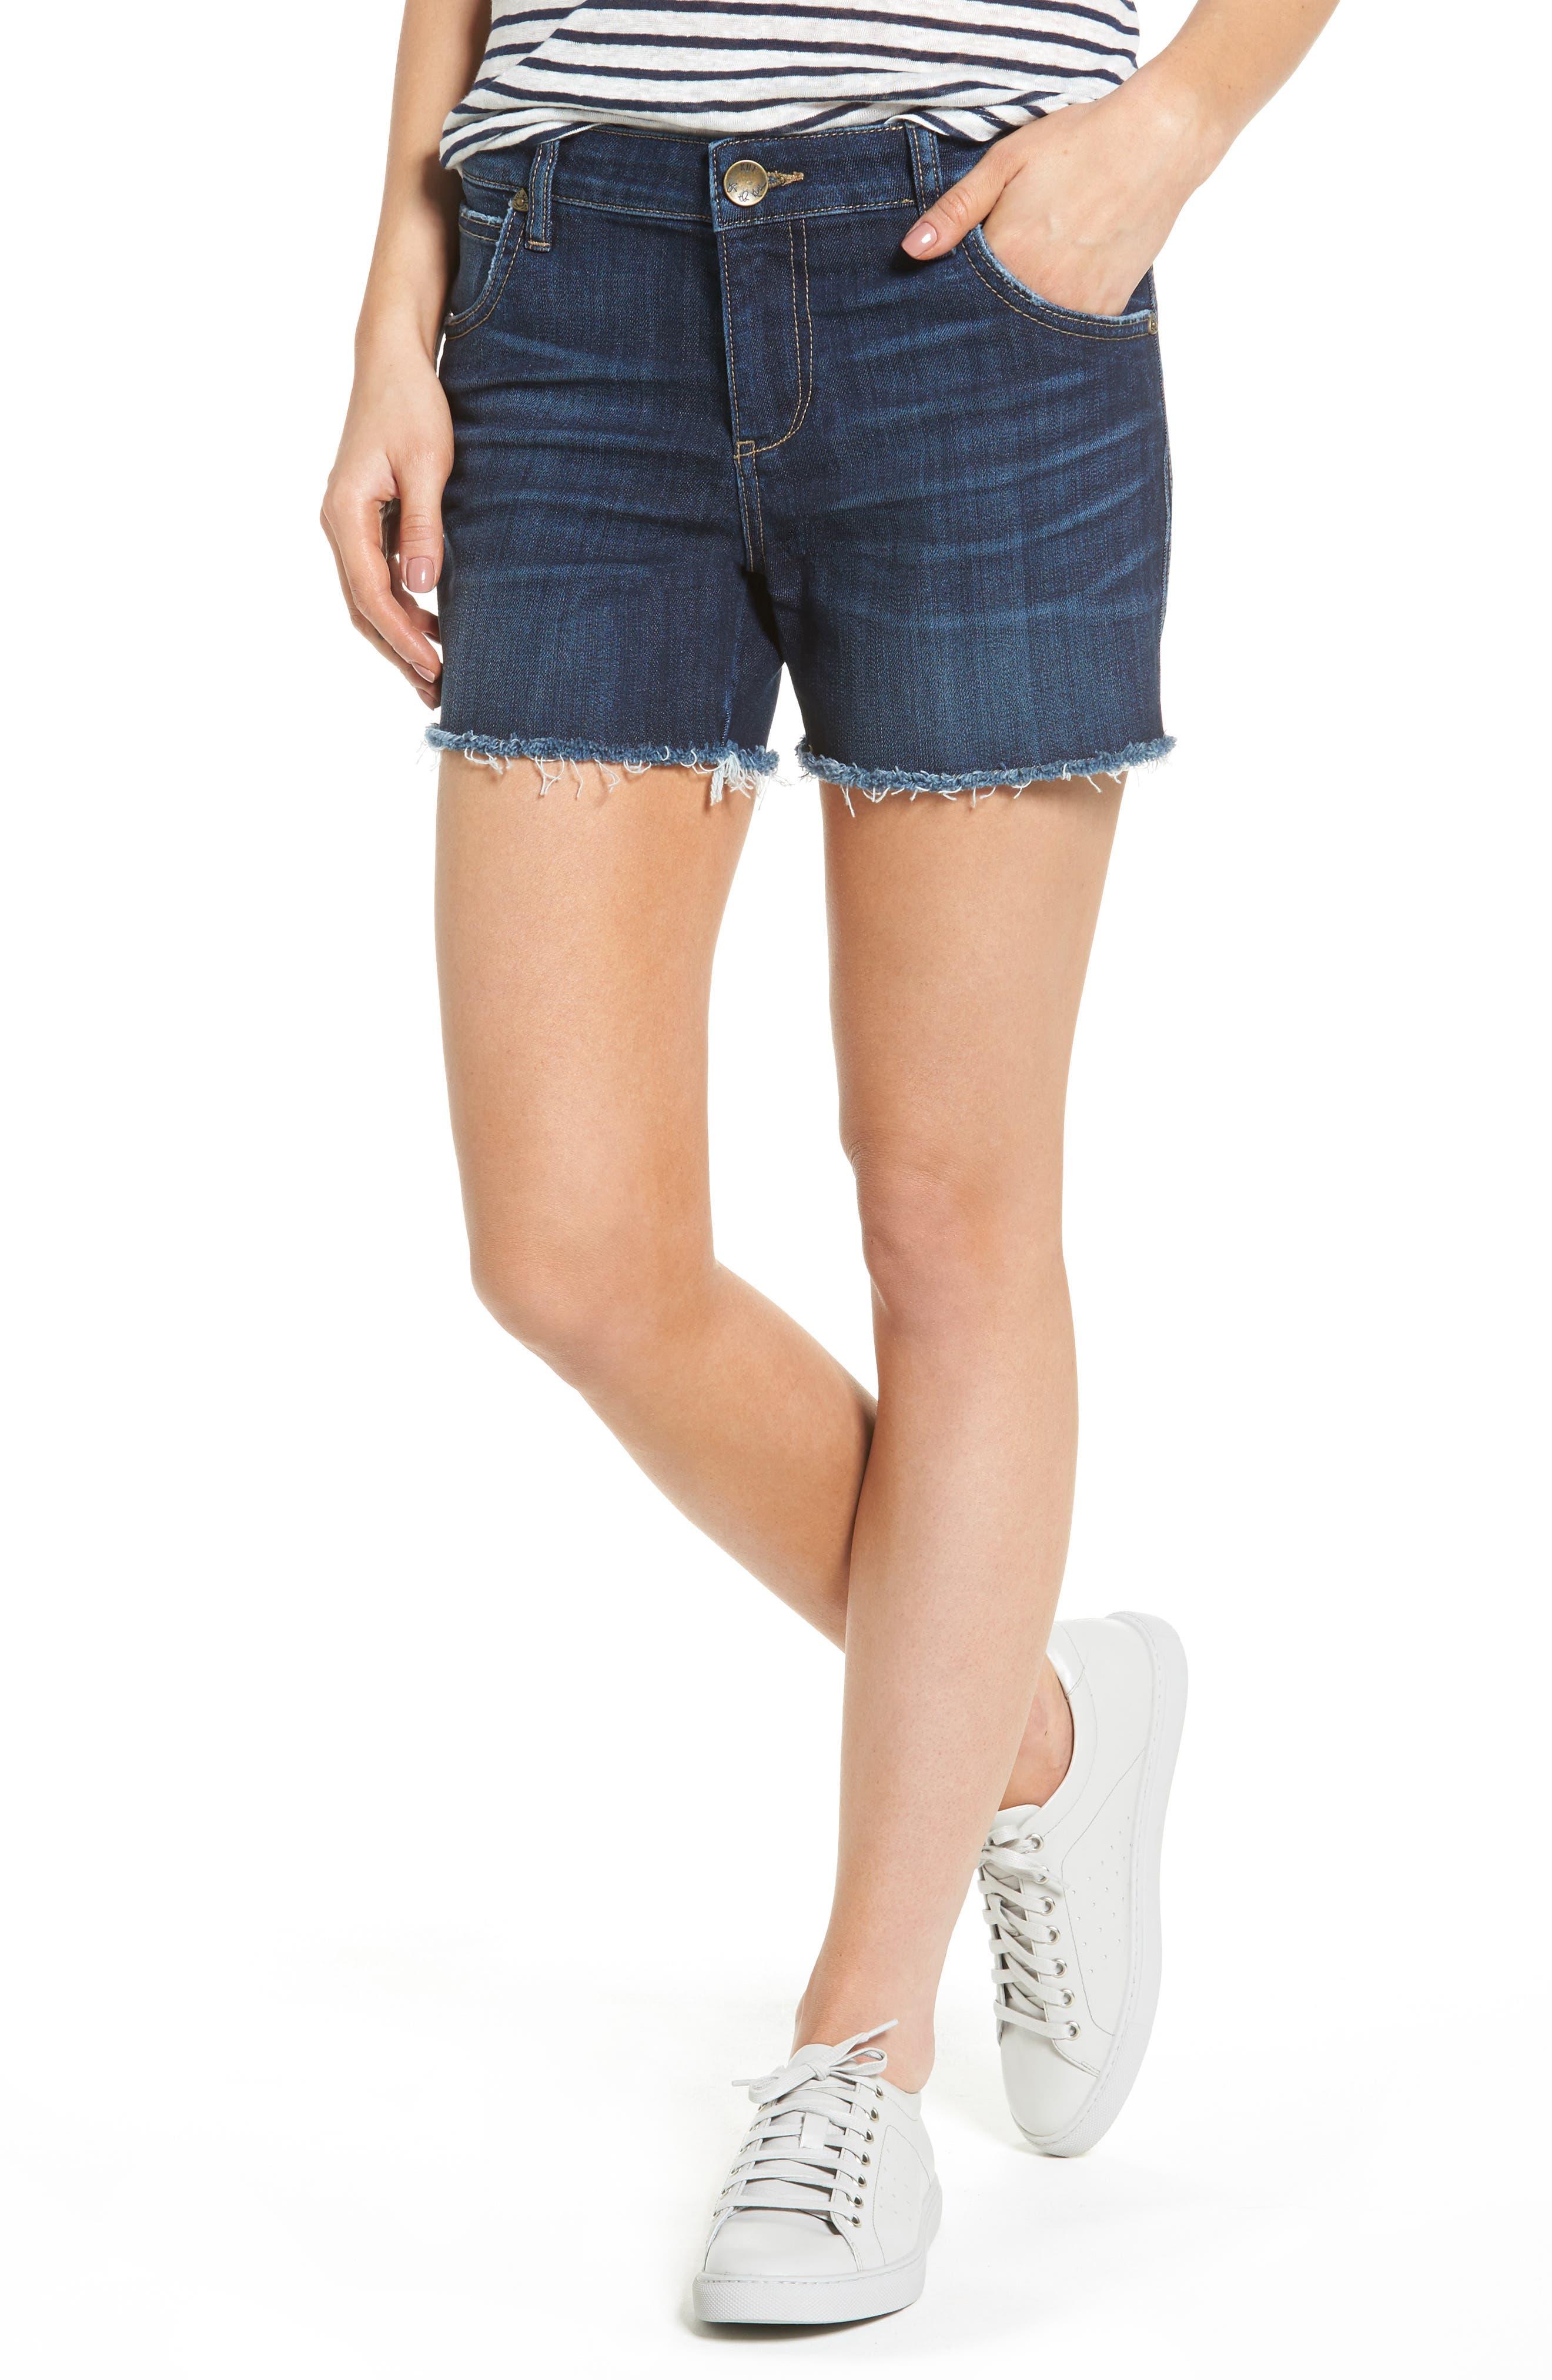 KUT from the Kloth Gidget Denim Cutoff Shorts